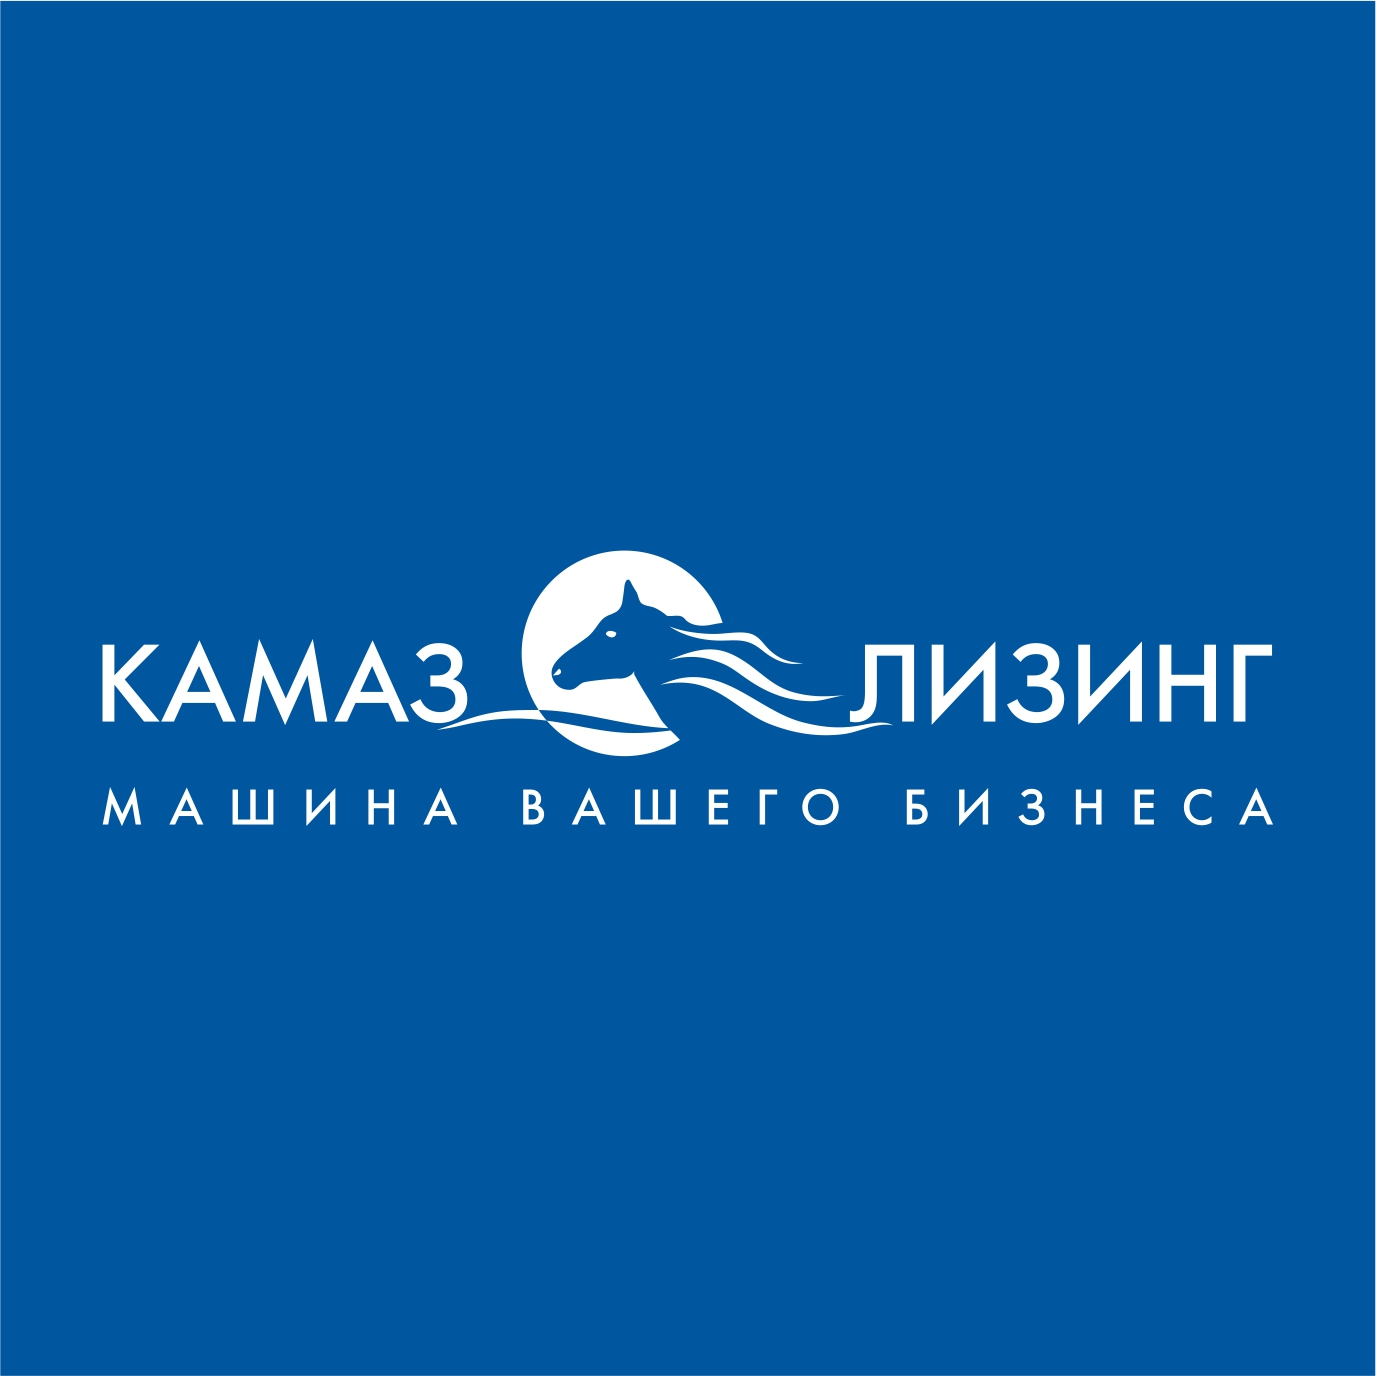 «КАМАЗ-ЛИЗИНГ» ПЕРЕВЫПОЛНИЛ БИЗНЕС-ПЛАН ОКТЯБРЯ